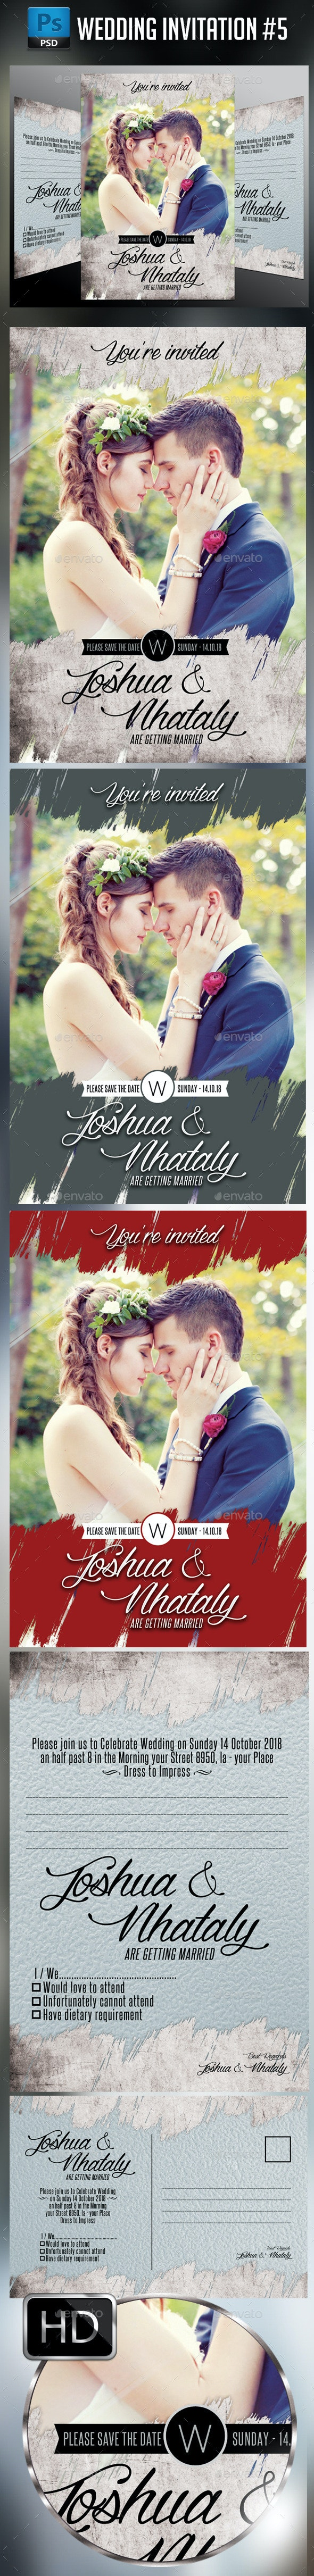 Wedding Invitation #5 - Weddings Cards & Invites